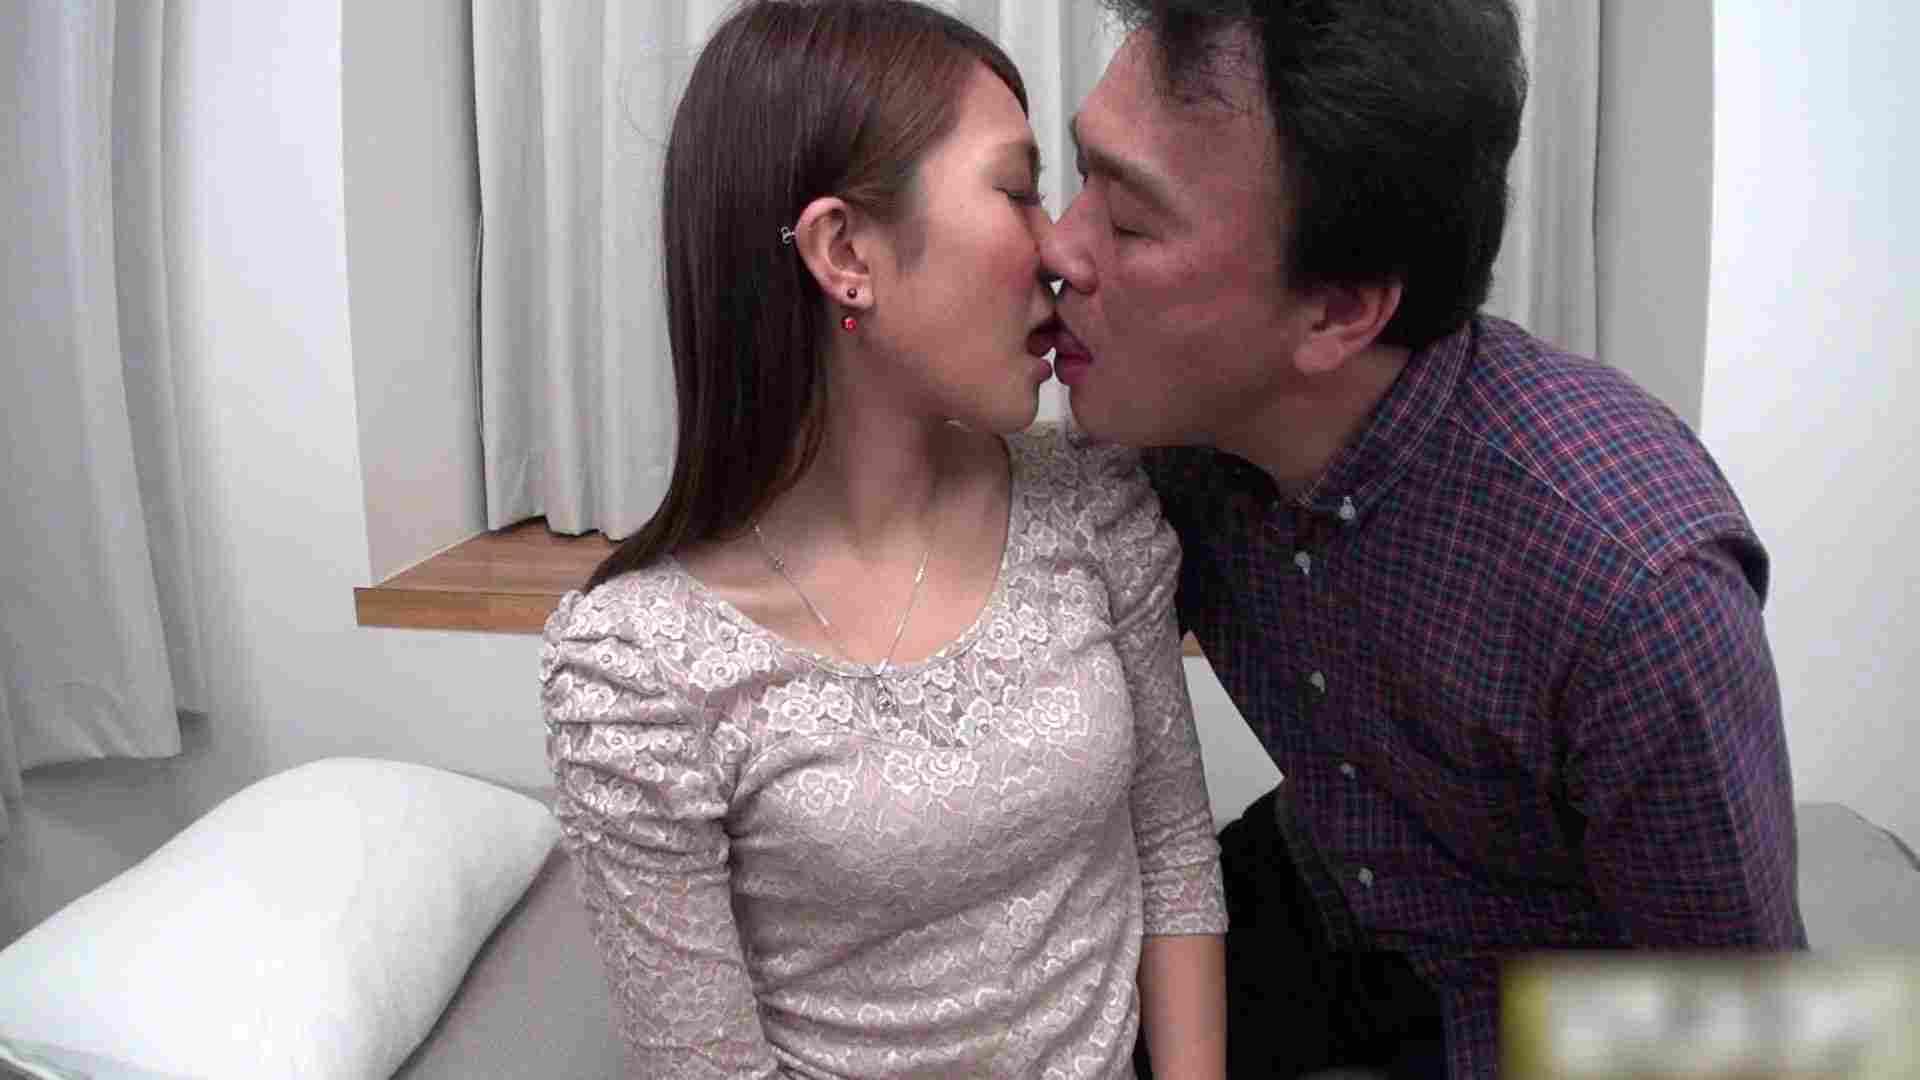 S級厳選美女ビッチガールVol.29 前編 OLエロ画像   美女エロ画像  89PICs 31